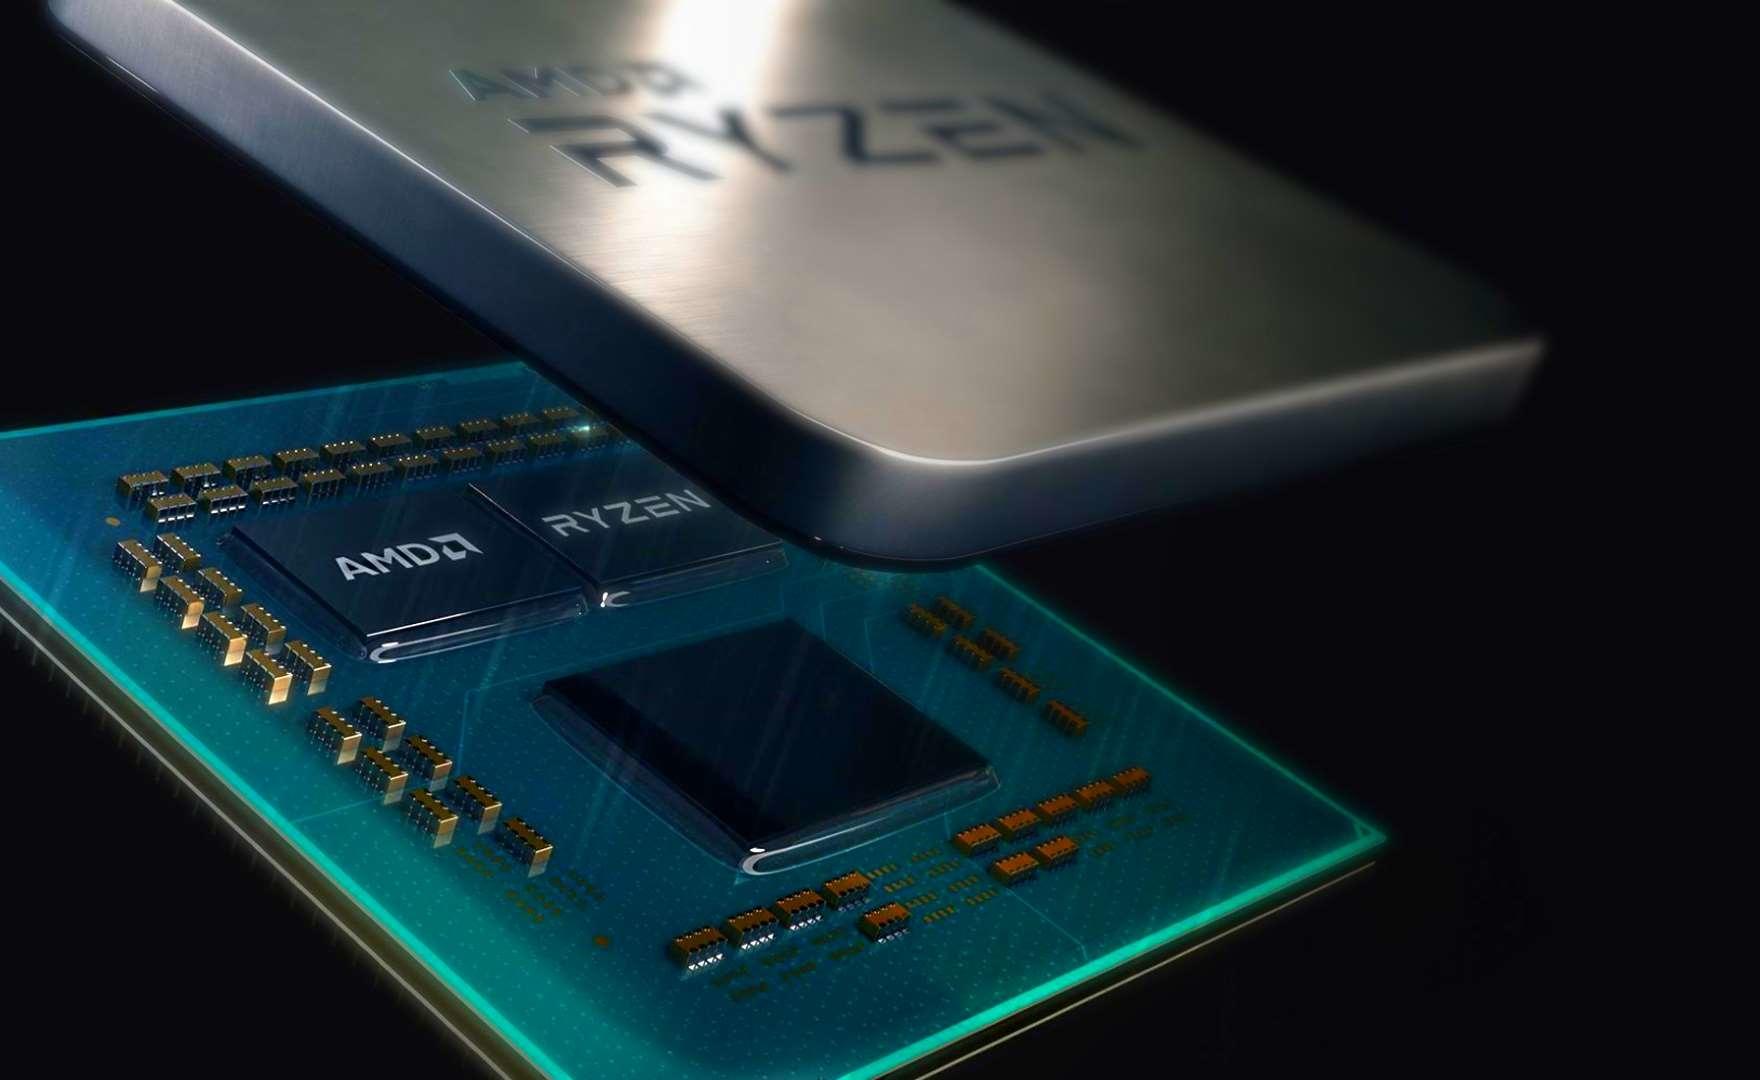 CPU vendute su Mindfactory, nuovo record per AMD: raggiunge l'82%